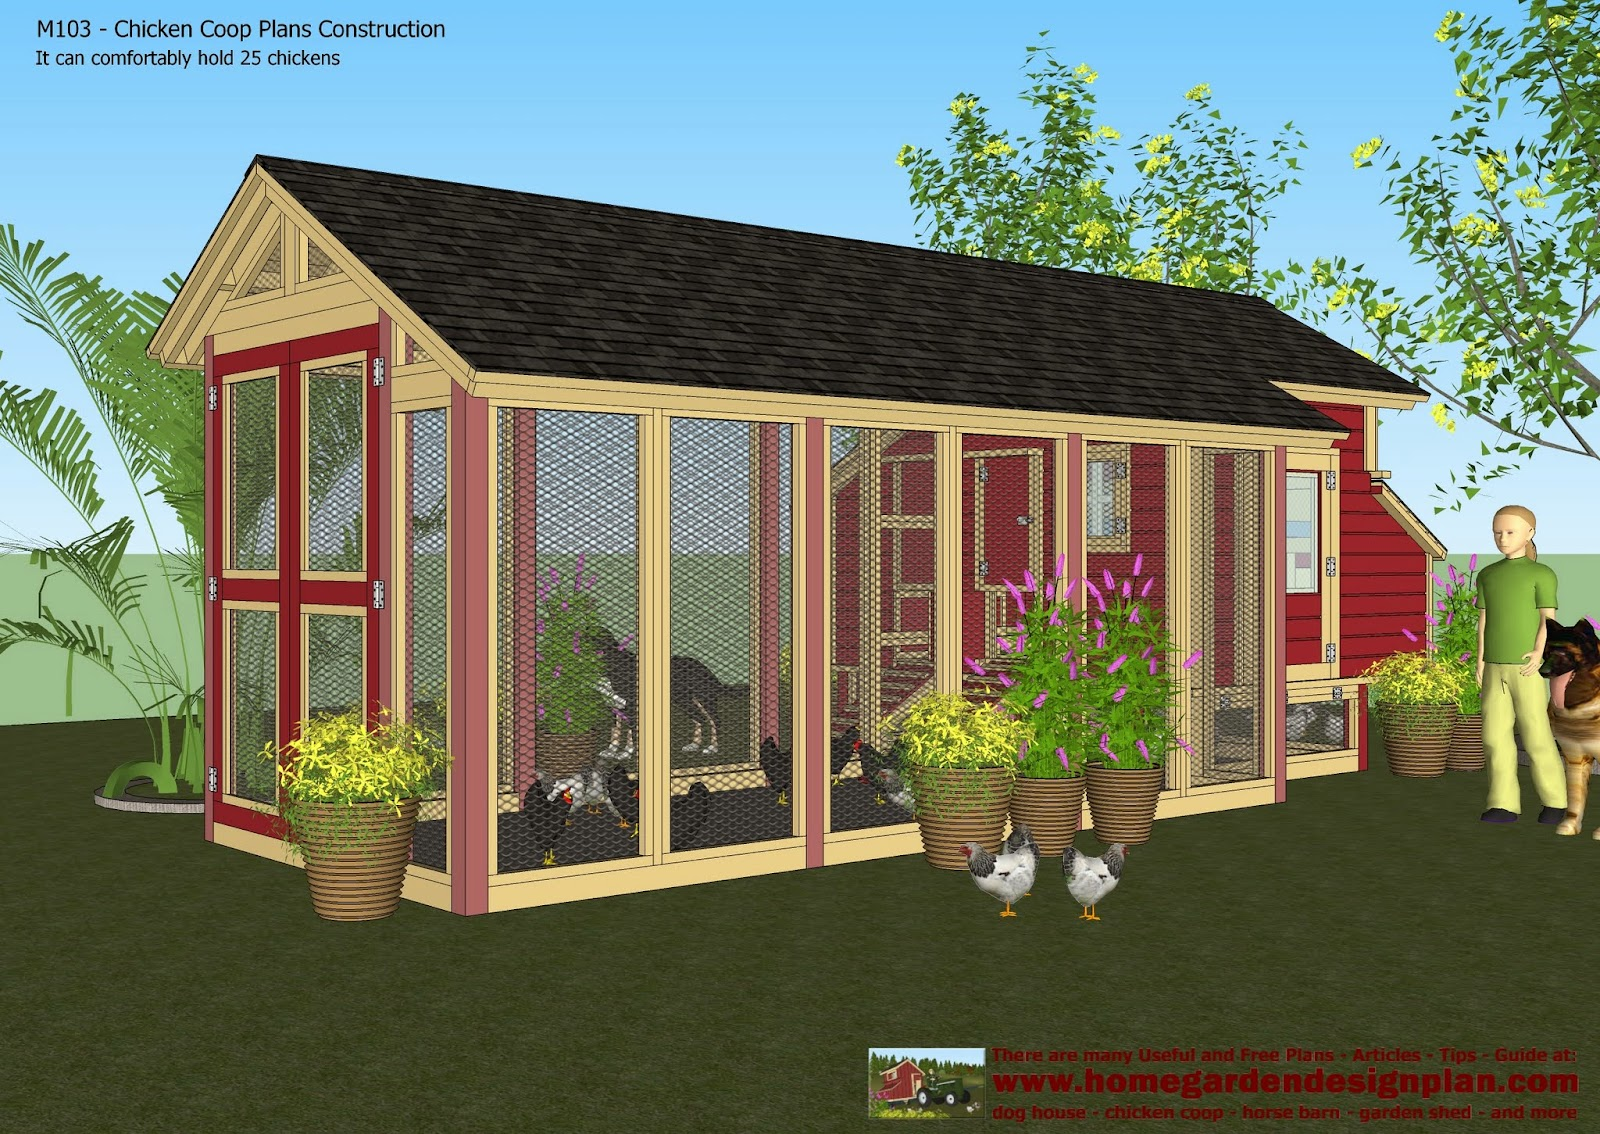 Ck coop 8x8 chicken coop design for 8x8 house plans